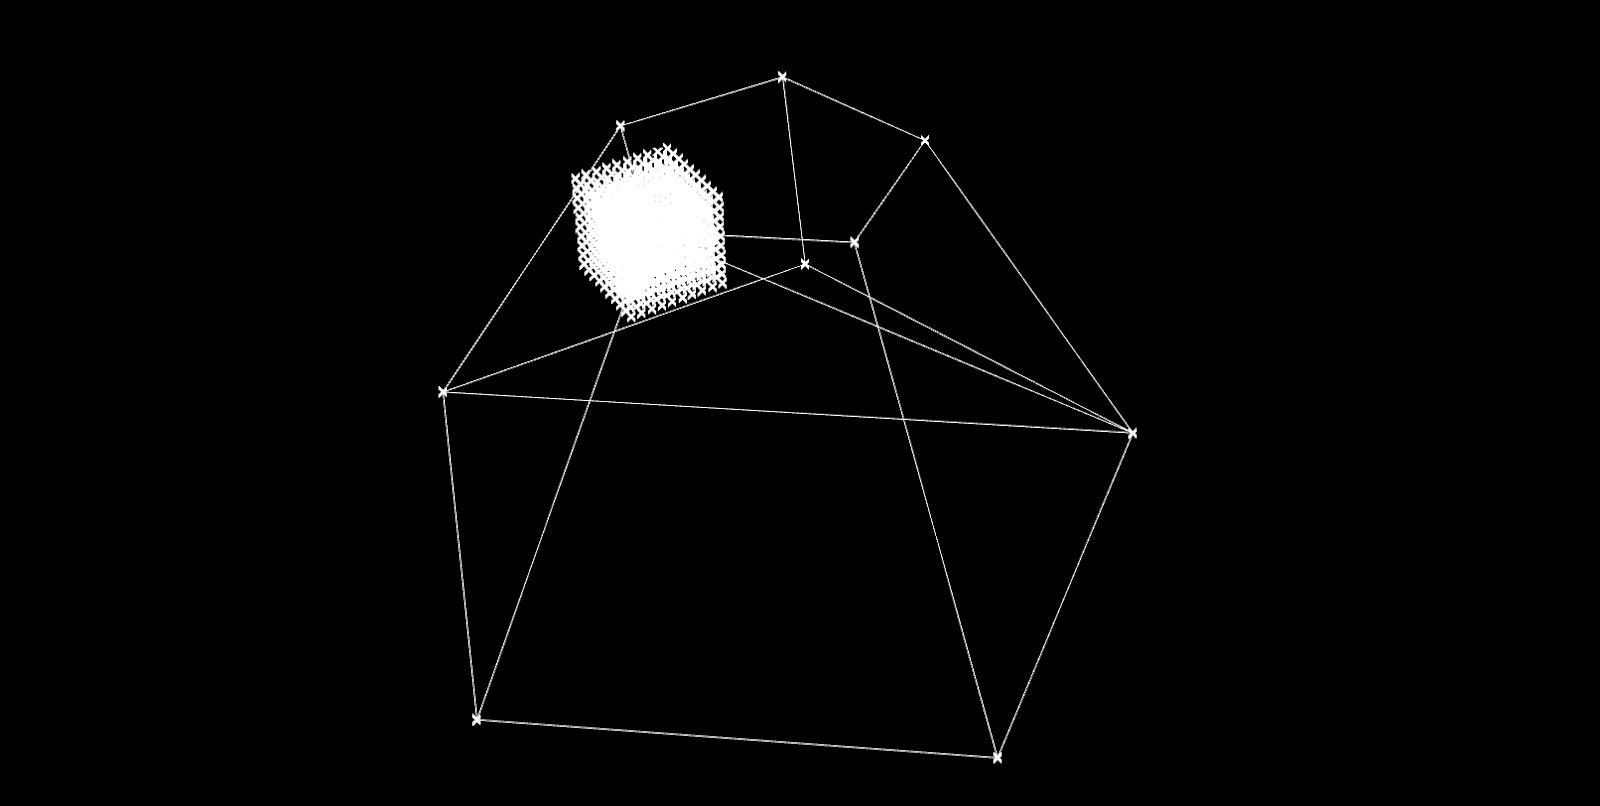 3_GridofPoints.jpg